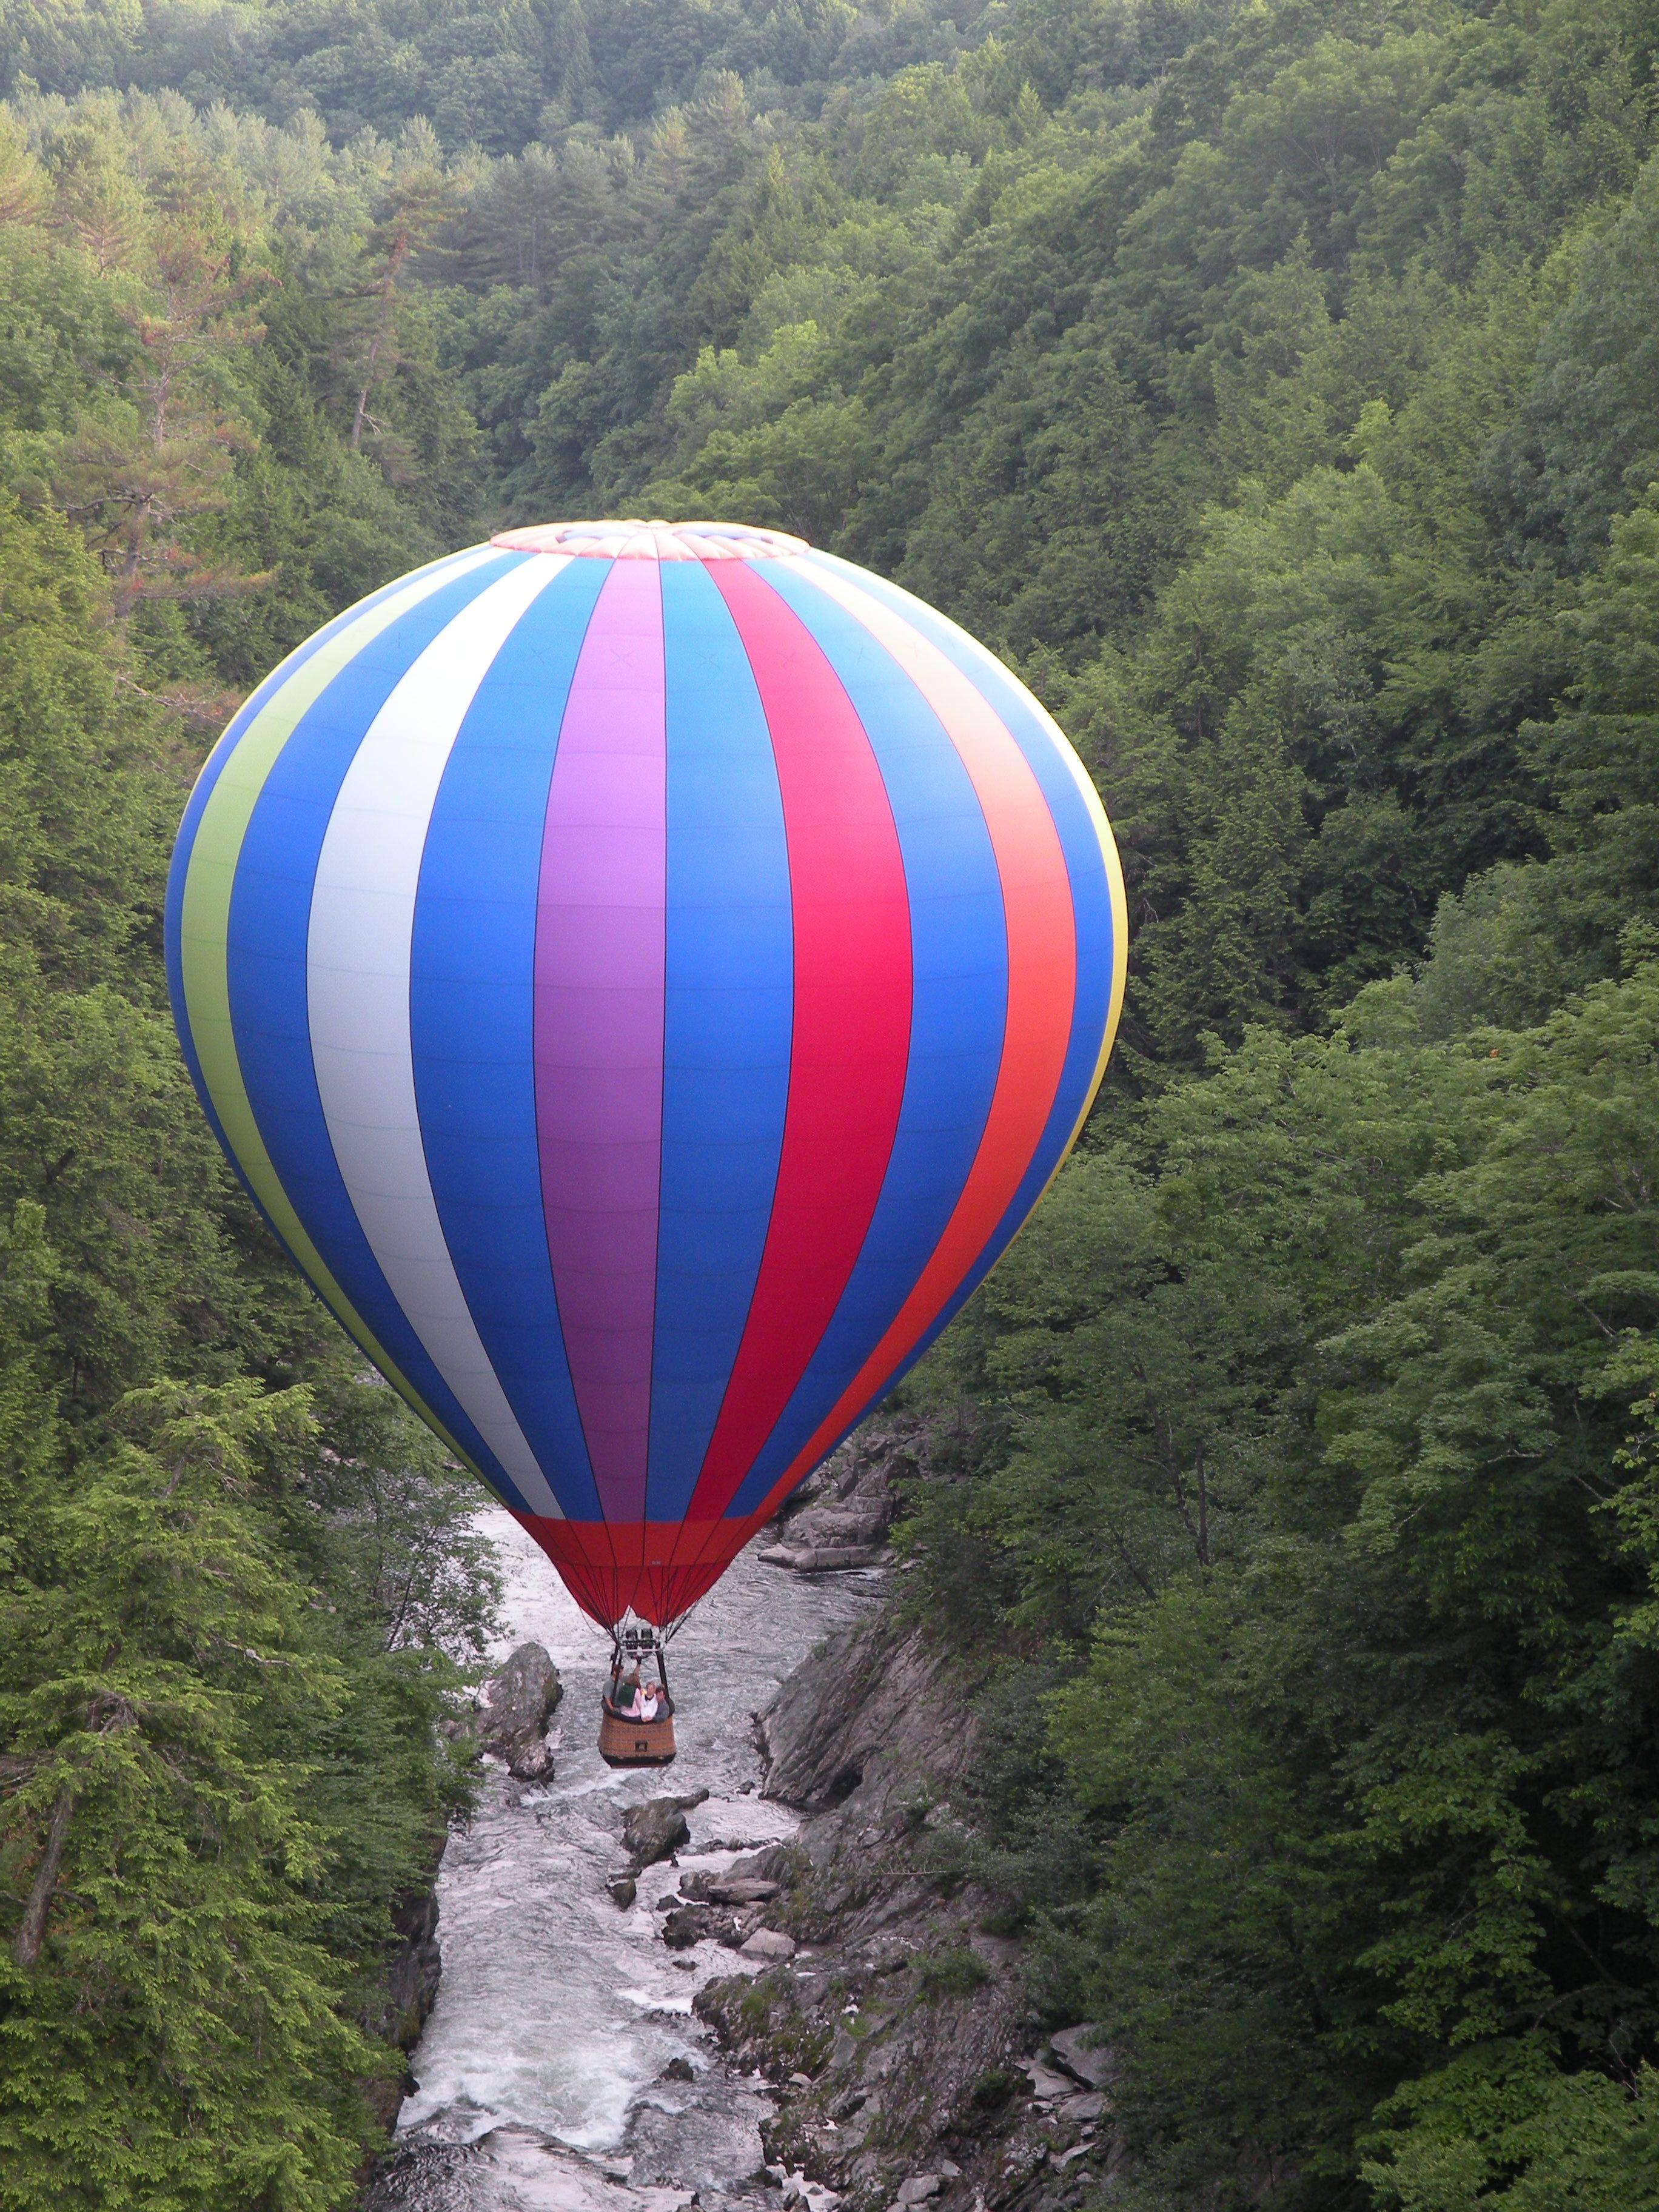 Quechee VT Hot air balloon rides, Balloon rides